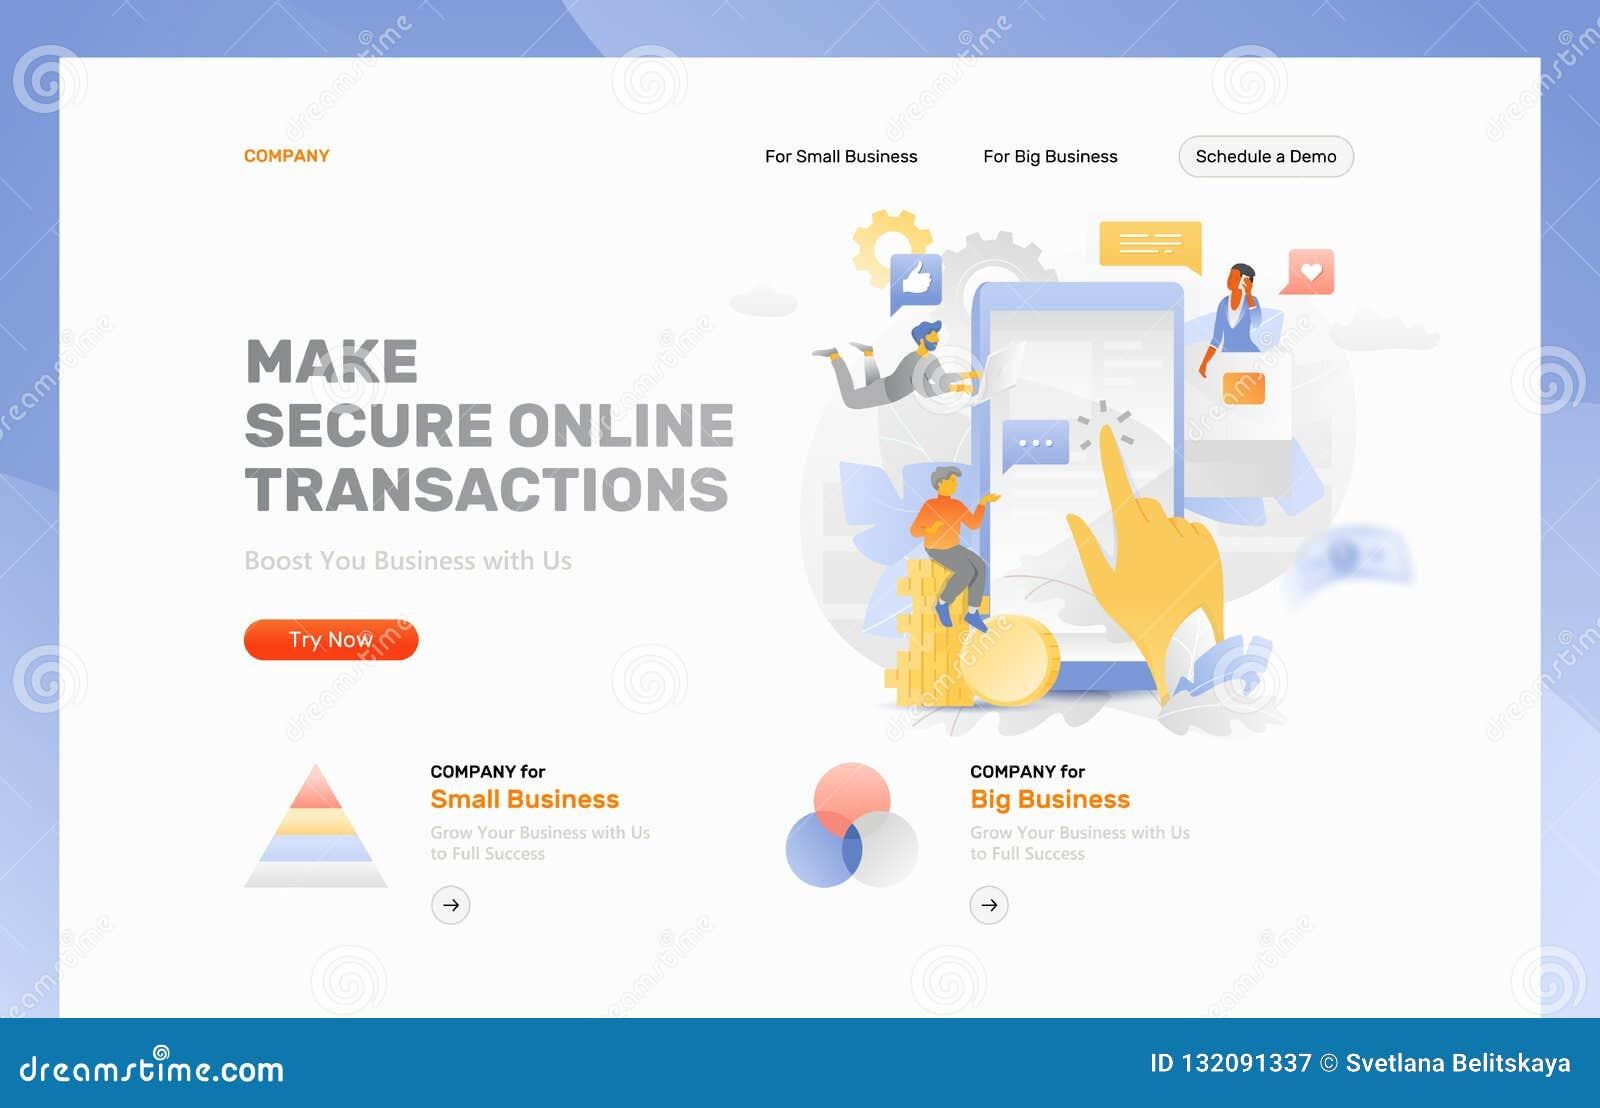 make online transactions header template stock vector illustration